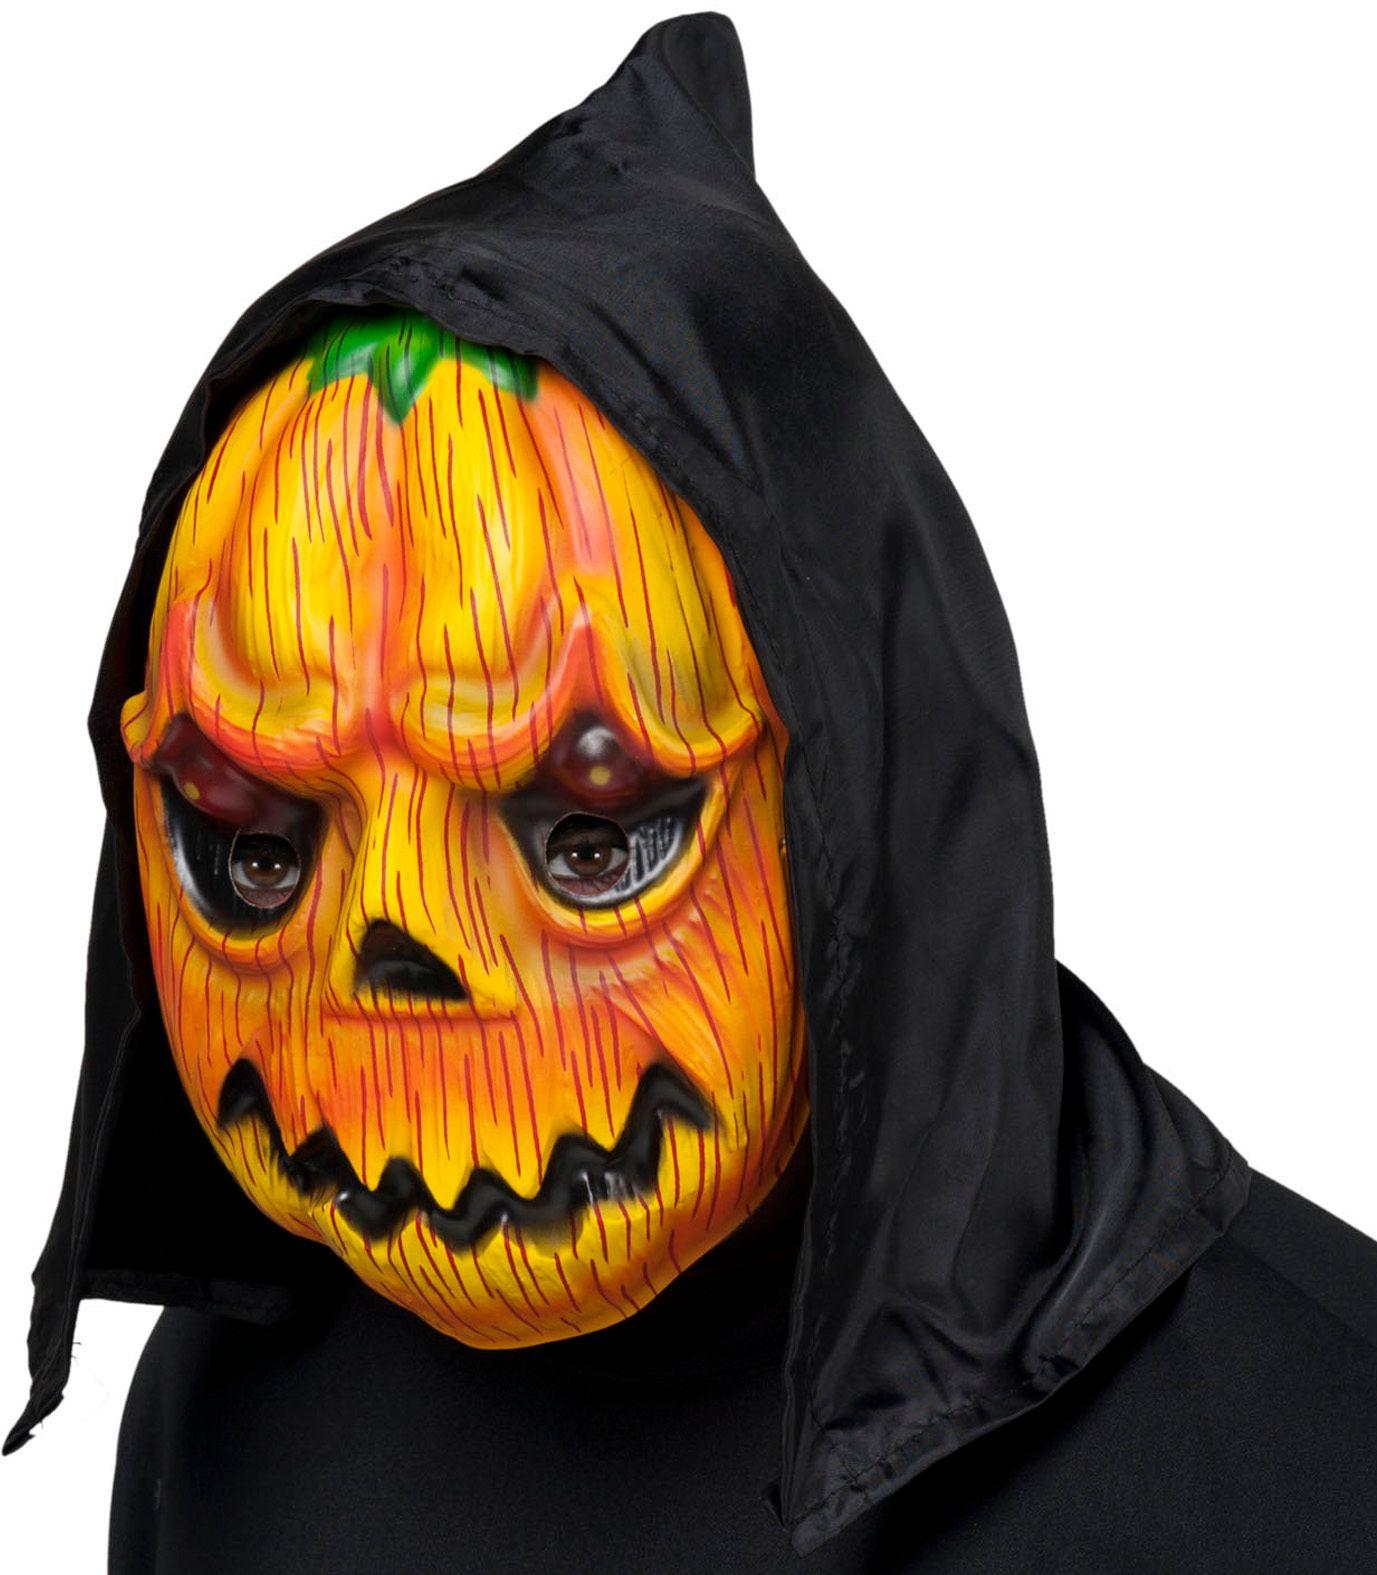 Pompoen masker met zwarte kap